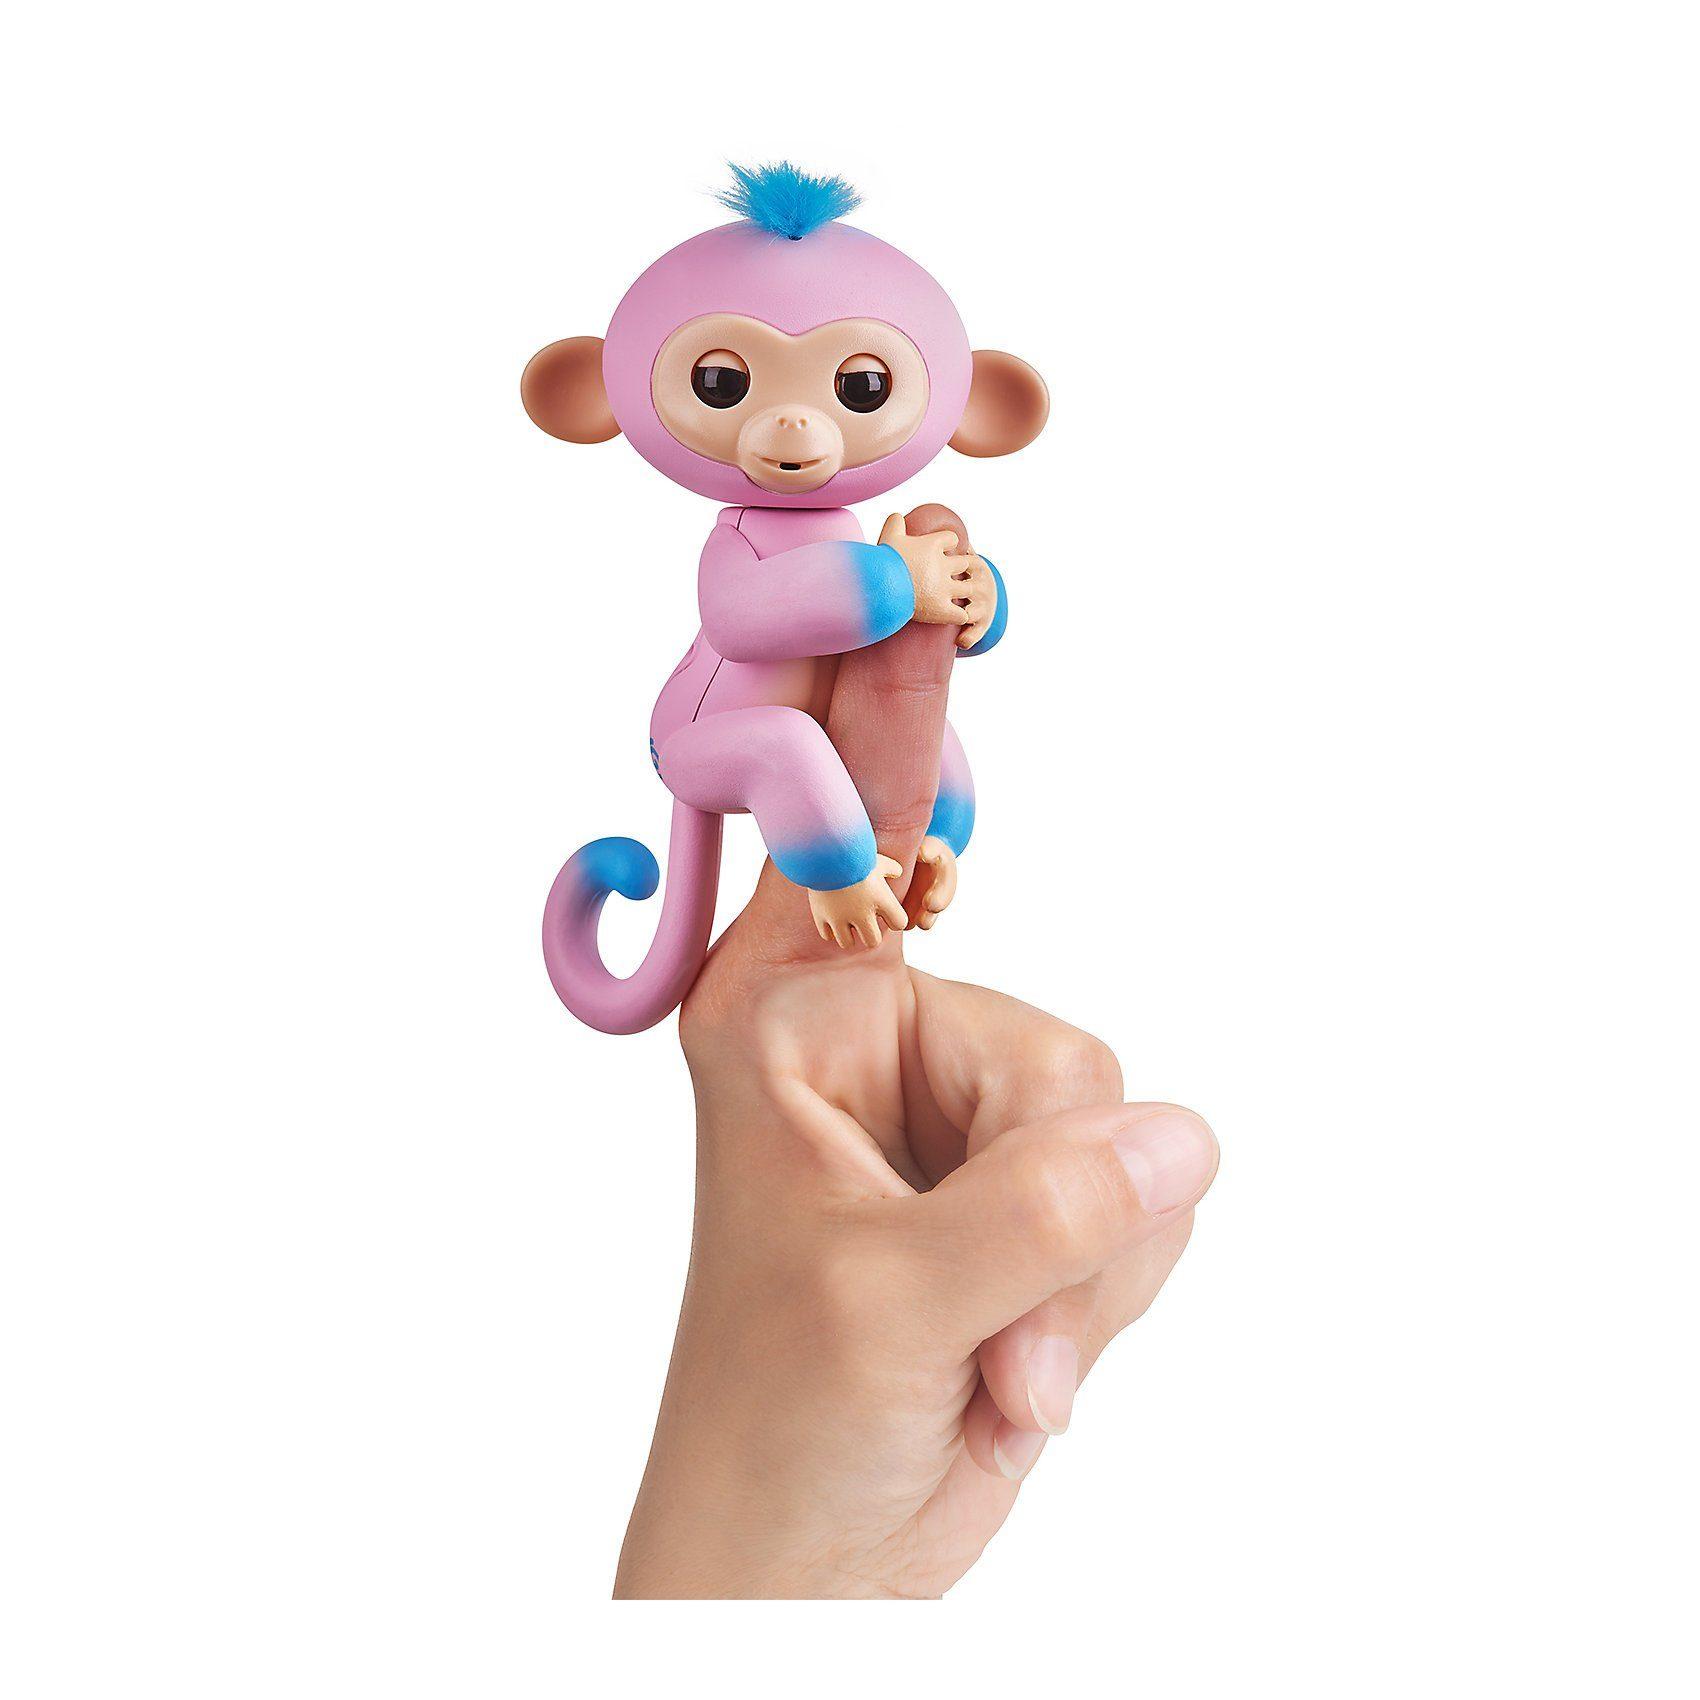 WowWee® - Fingerlings Äffchen 2farbig Candi pink & blau